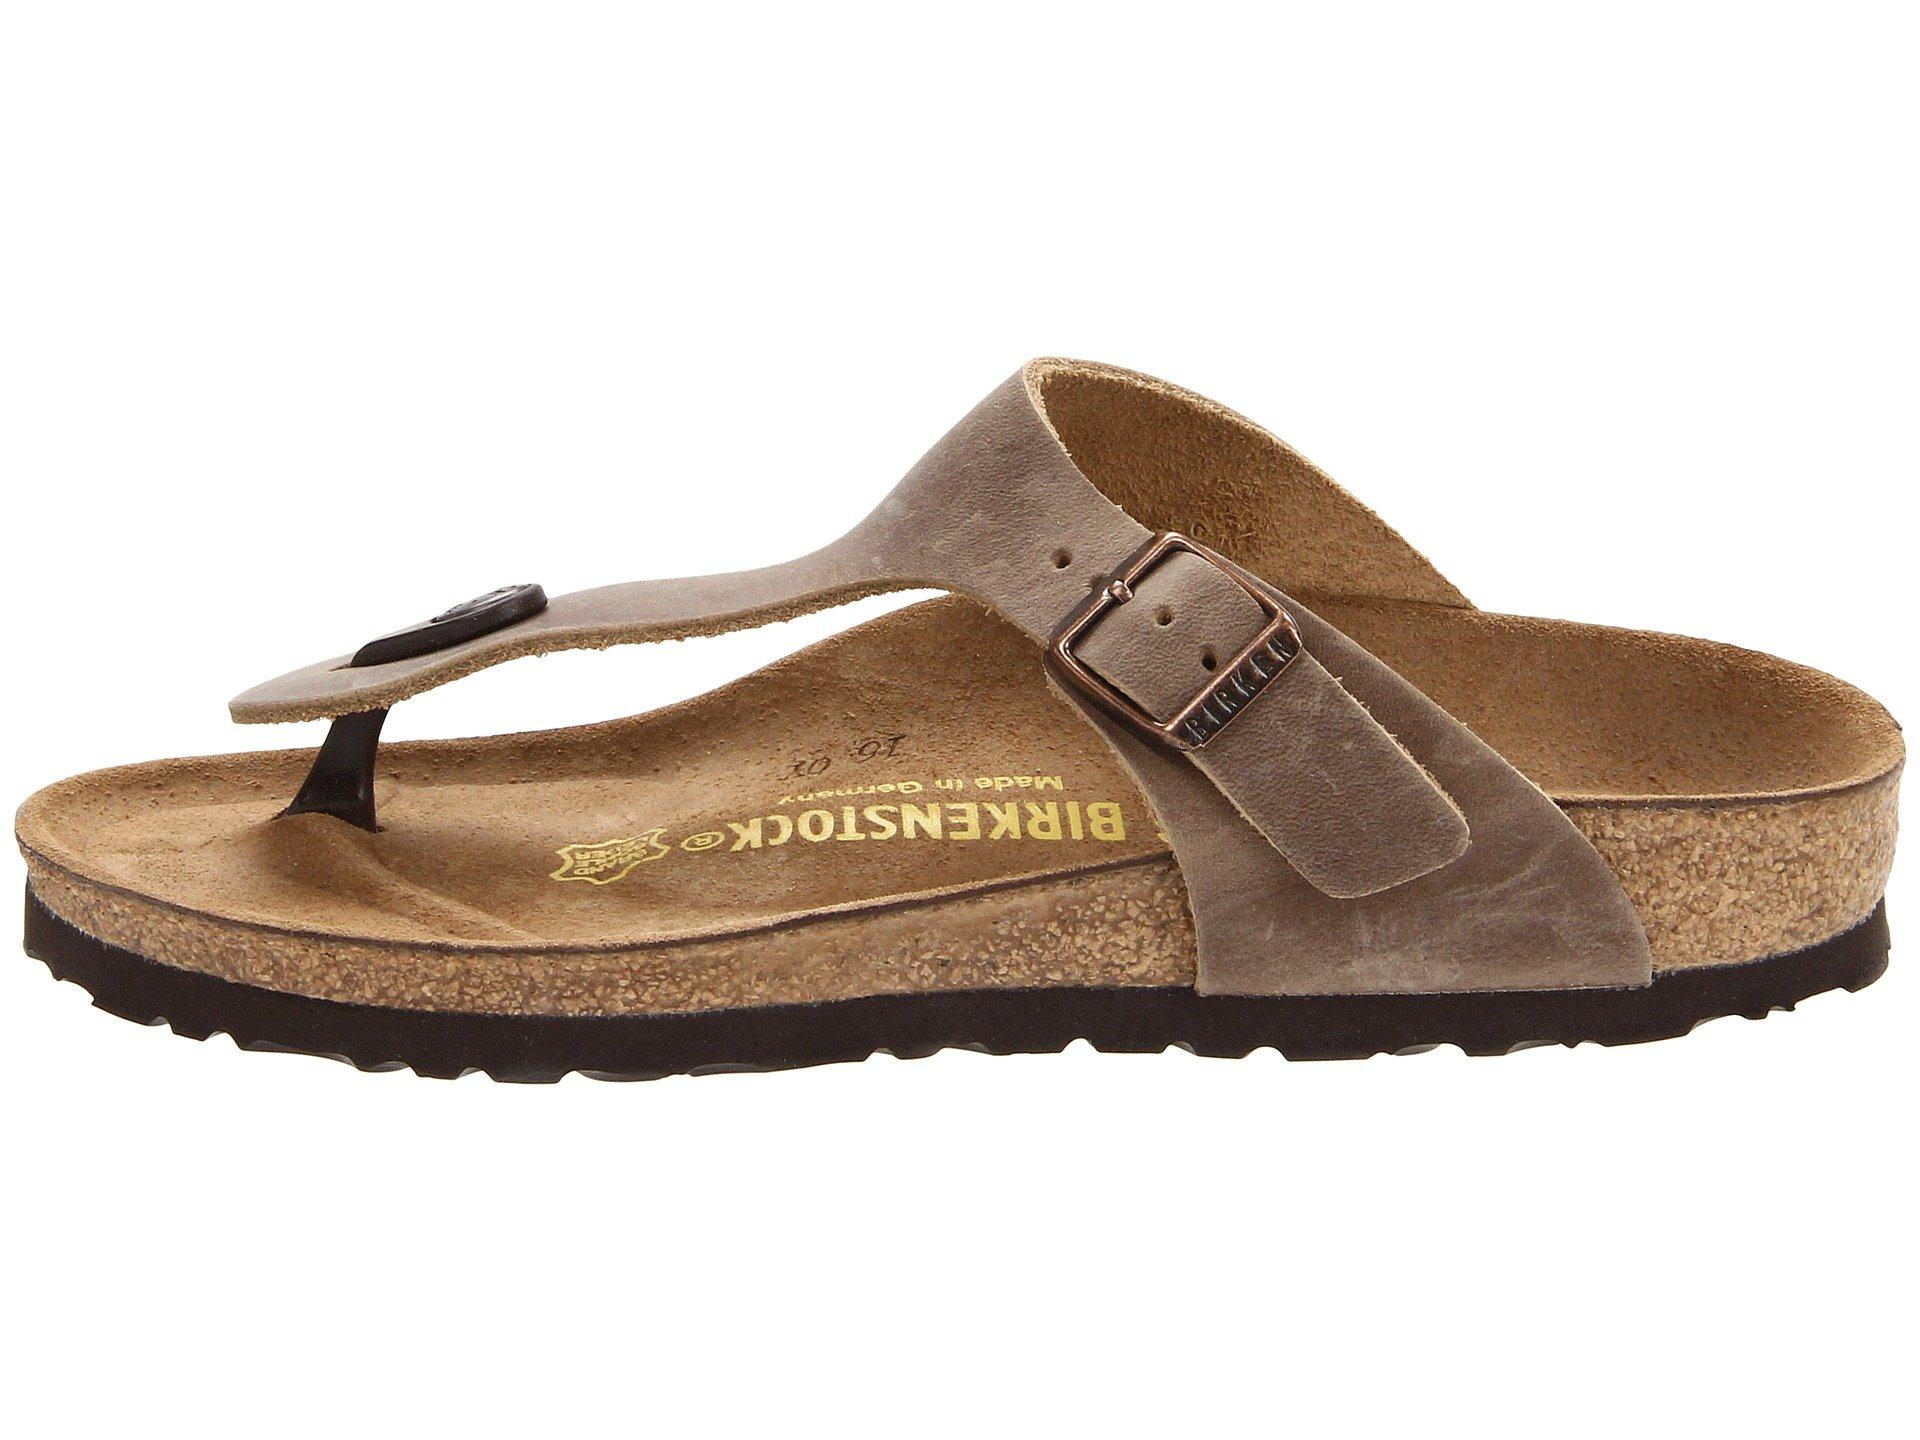 17c4191ca053f Coupon Birkenstock Rio Sale Usa Beach Sandals